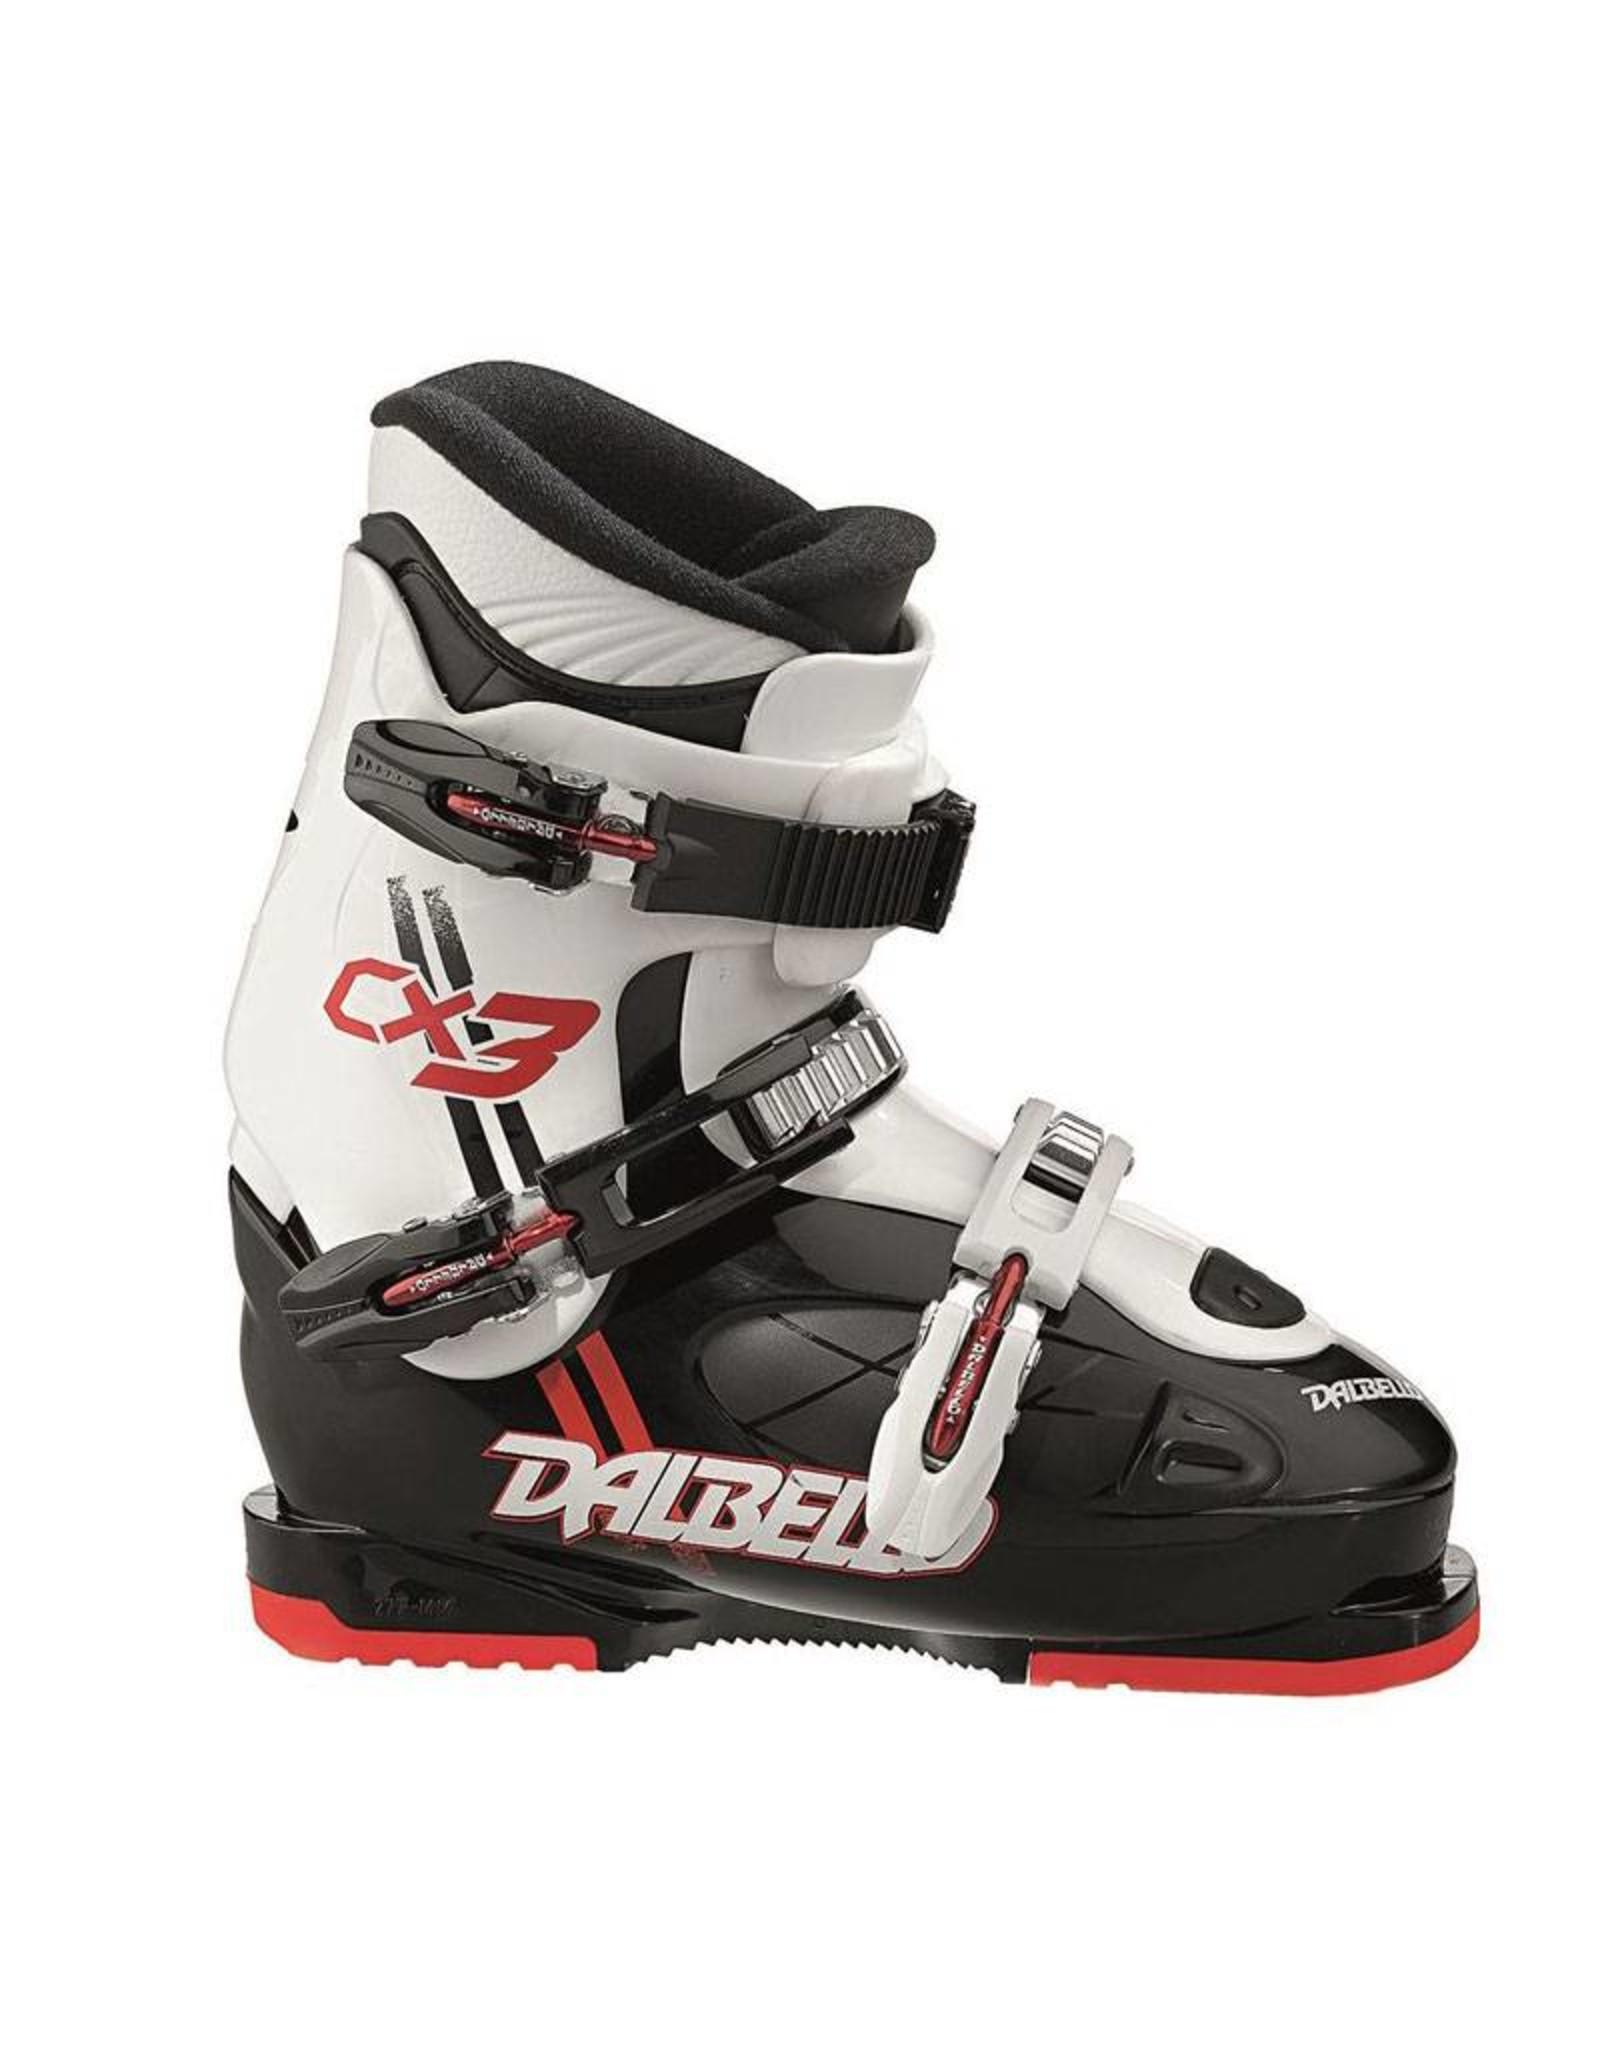 DALBELLO Skischoenen DALBELLO CX 3 (N)  Gebruikt